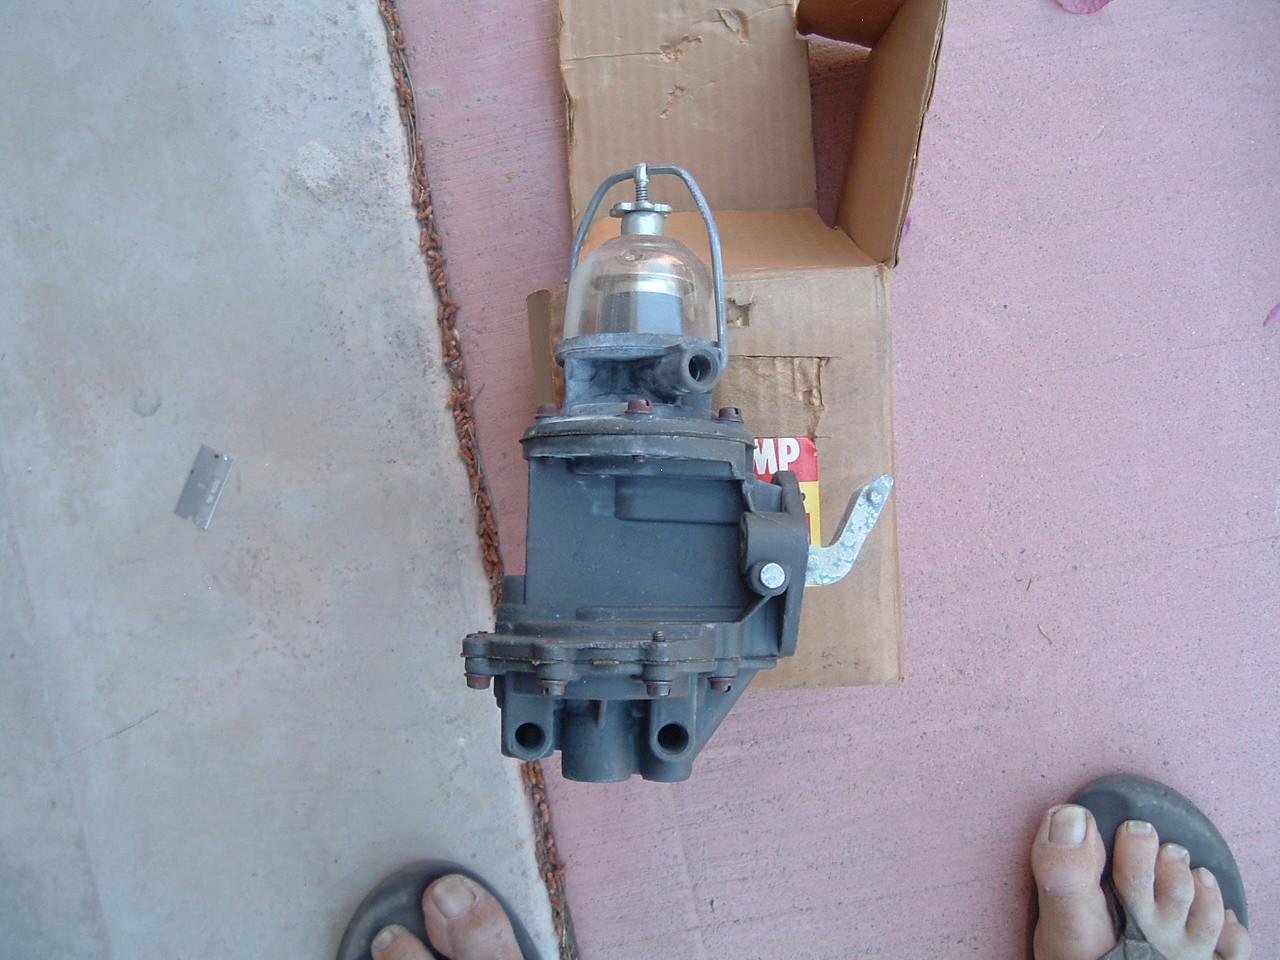 View Product1952 1953 1954 Chevrolet double action fuel pump 9797 (1) (z 9797rb)